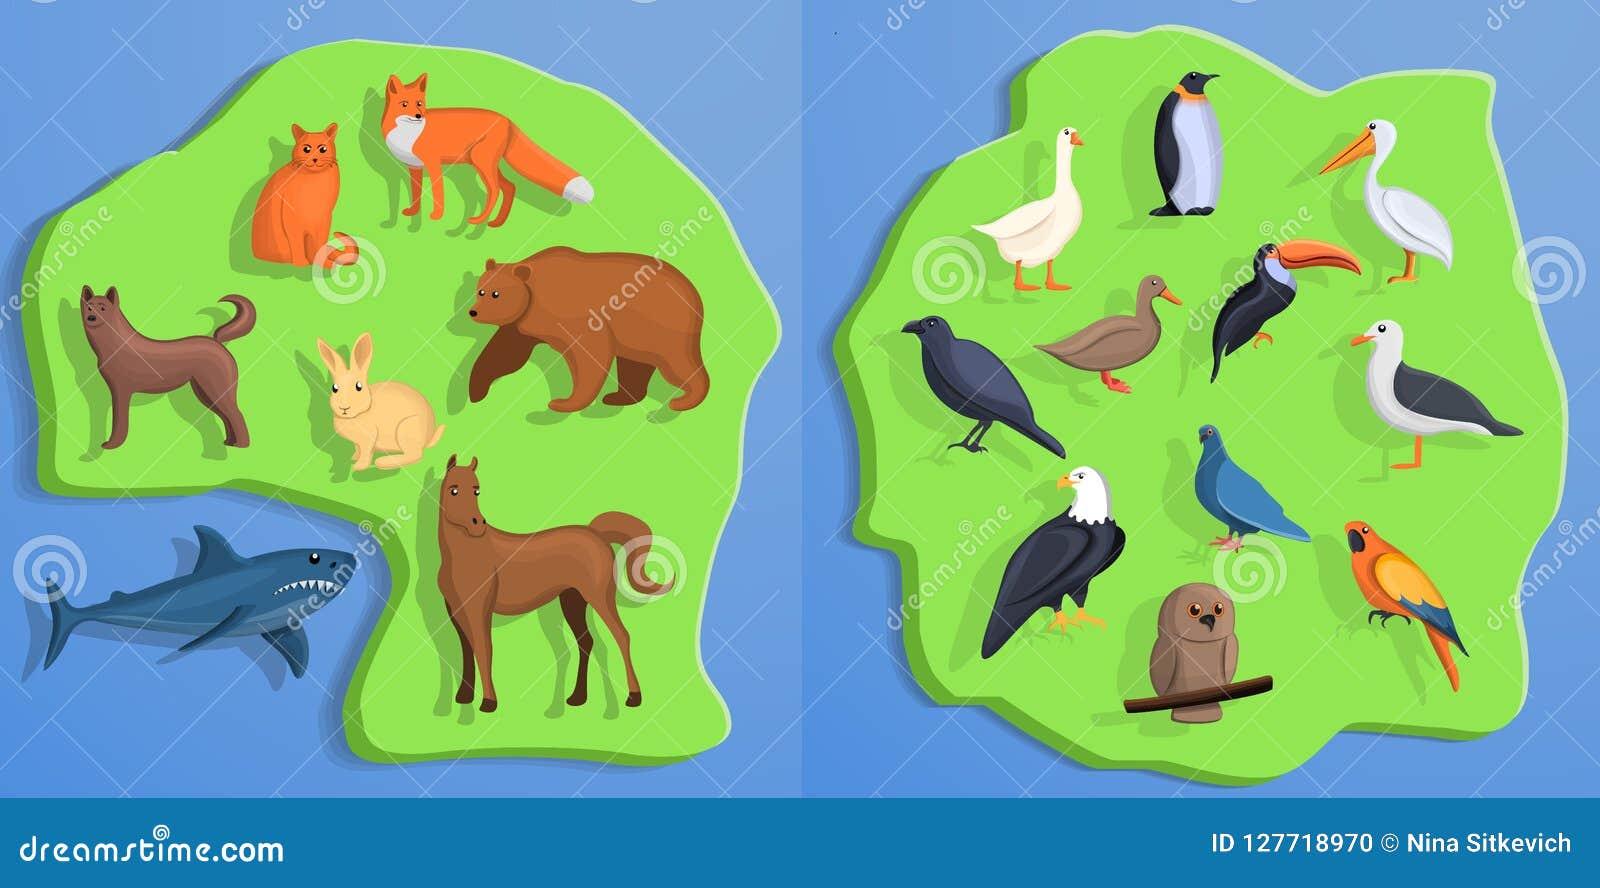 Sistema de la bandera de los animales, estilo de la historieta